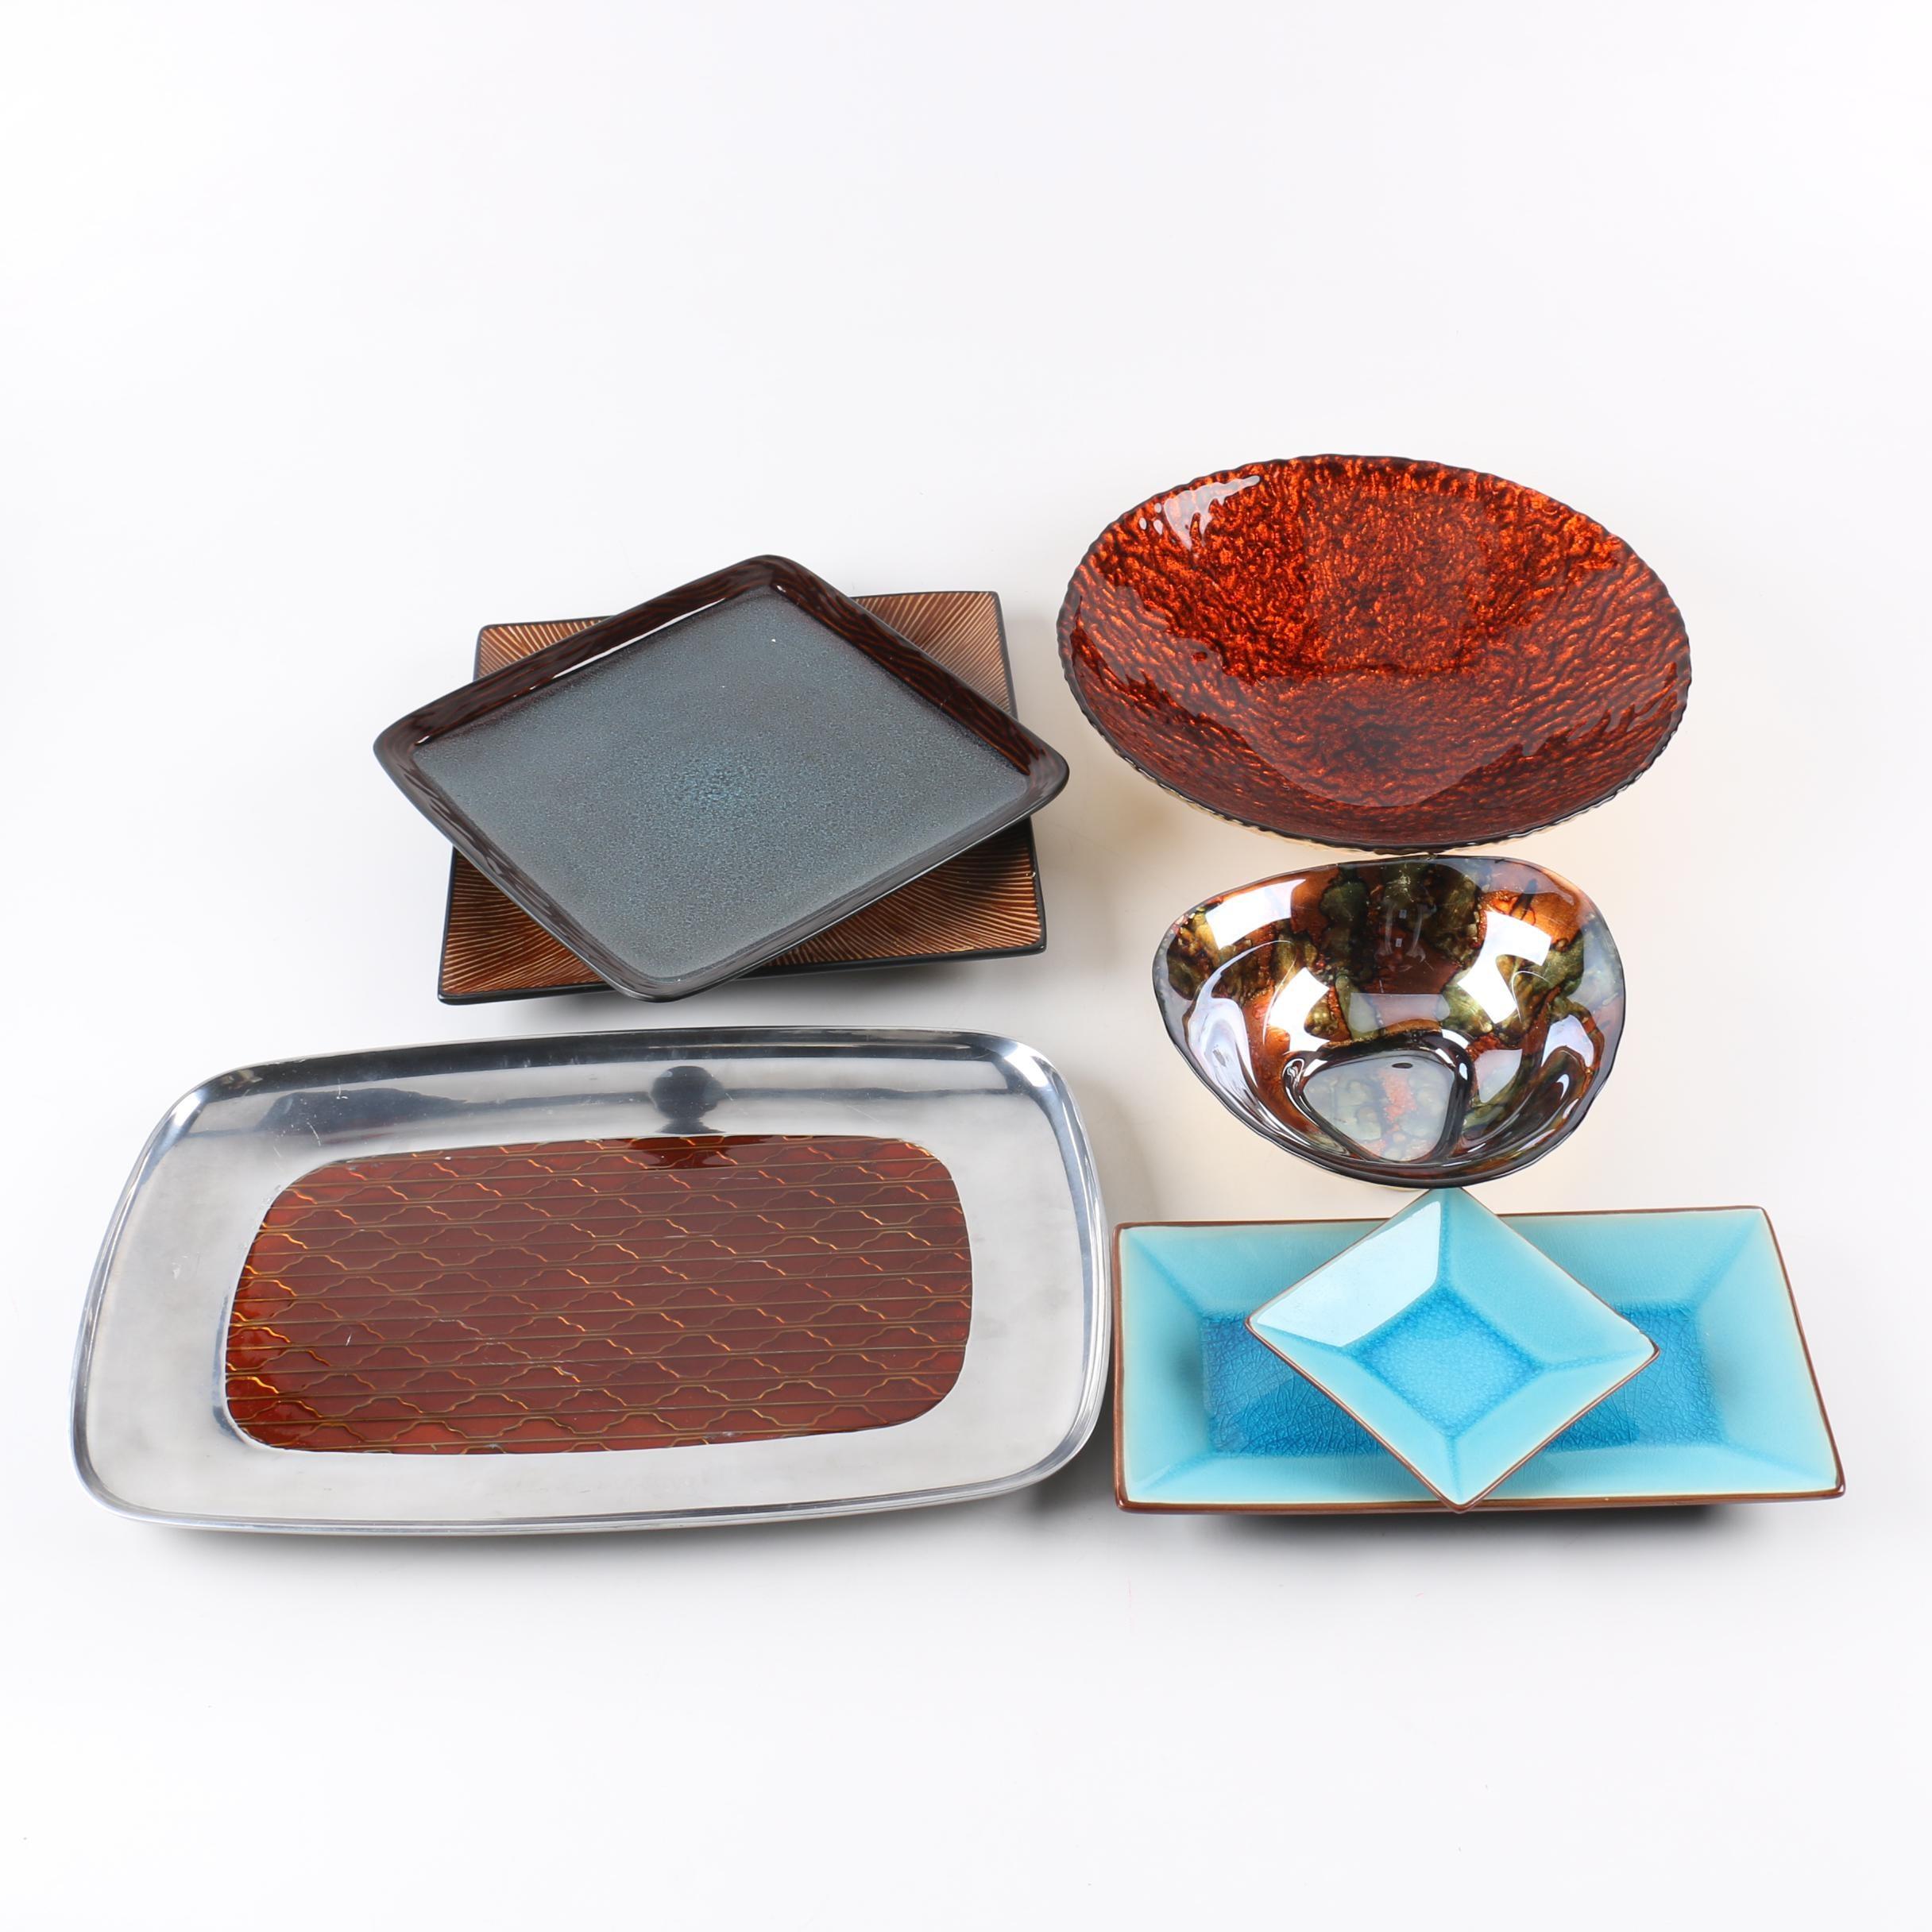 Decorative Serveware Including Mid Century Modern Style Tray